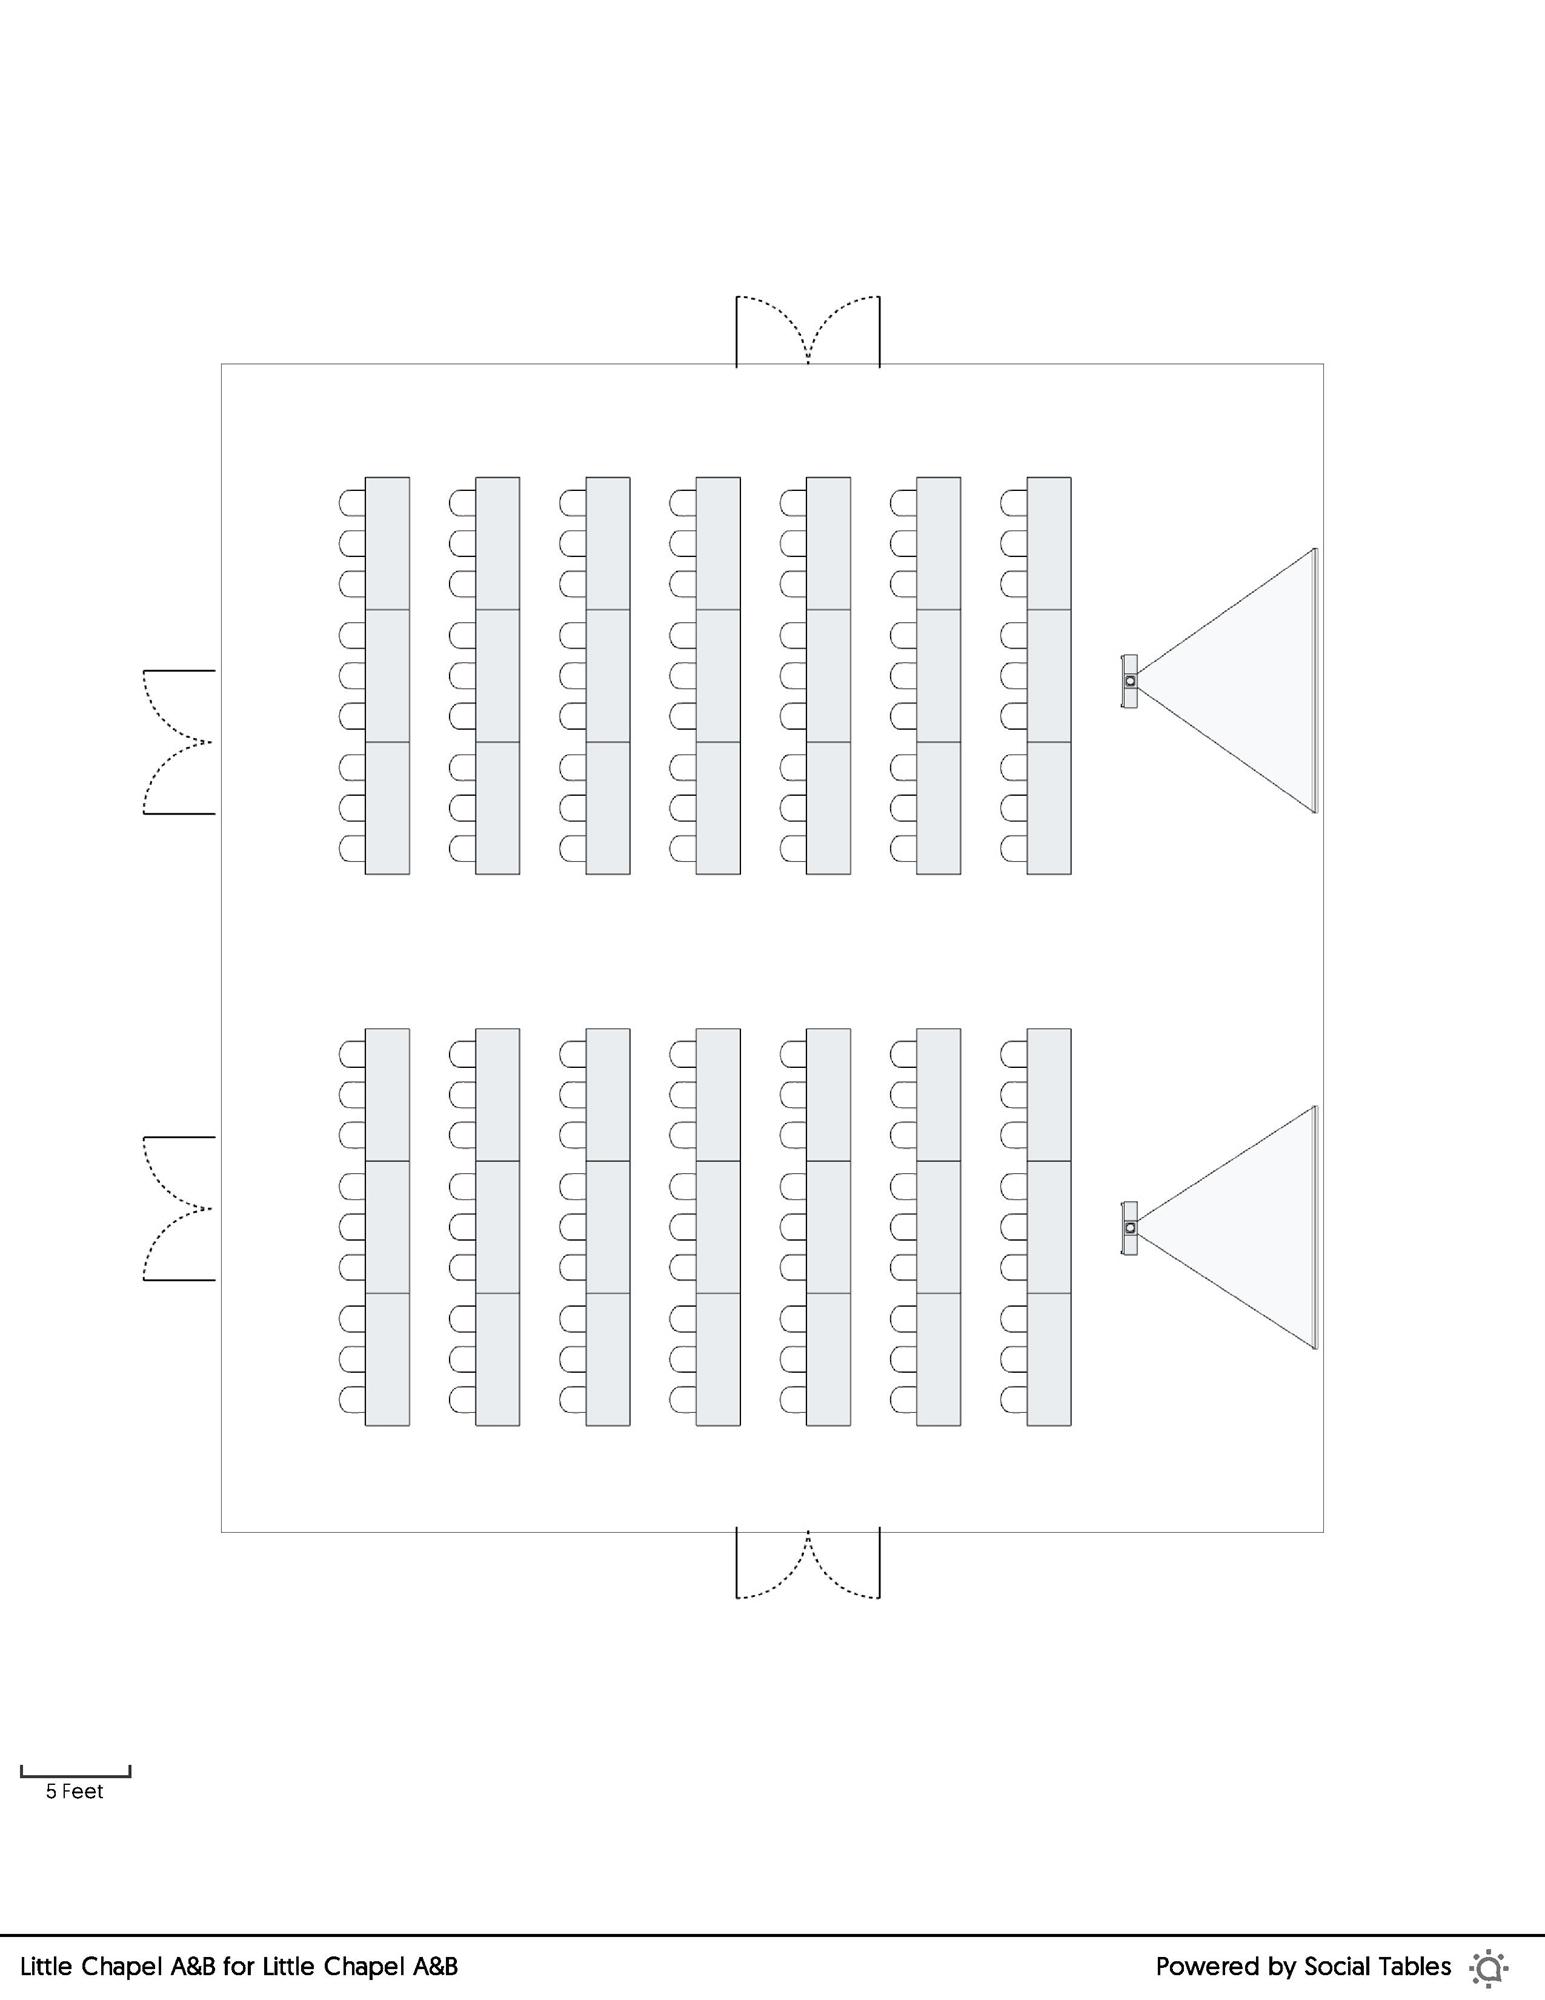 Little Chapel A&B Classroom floorplan